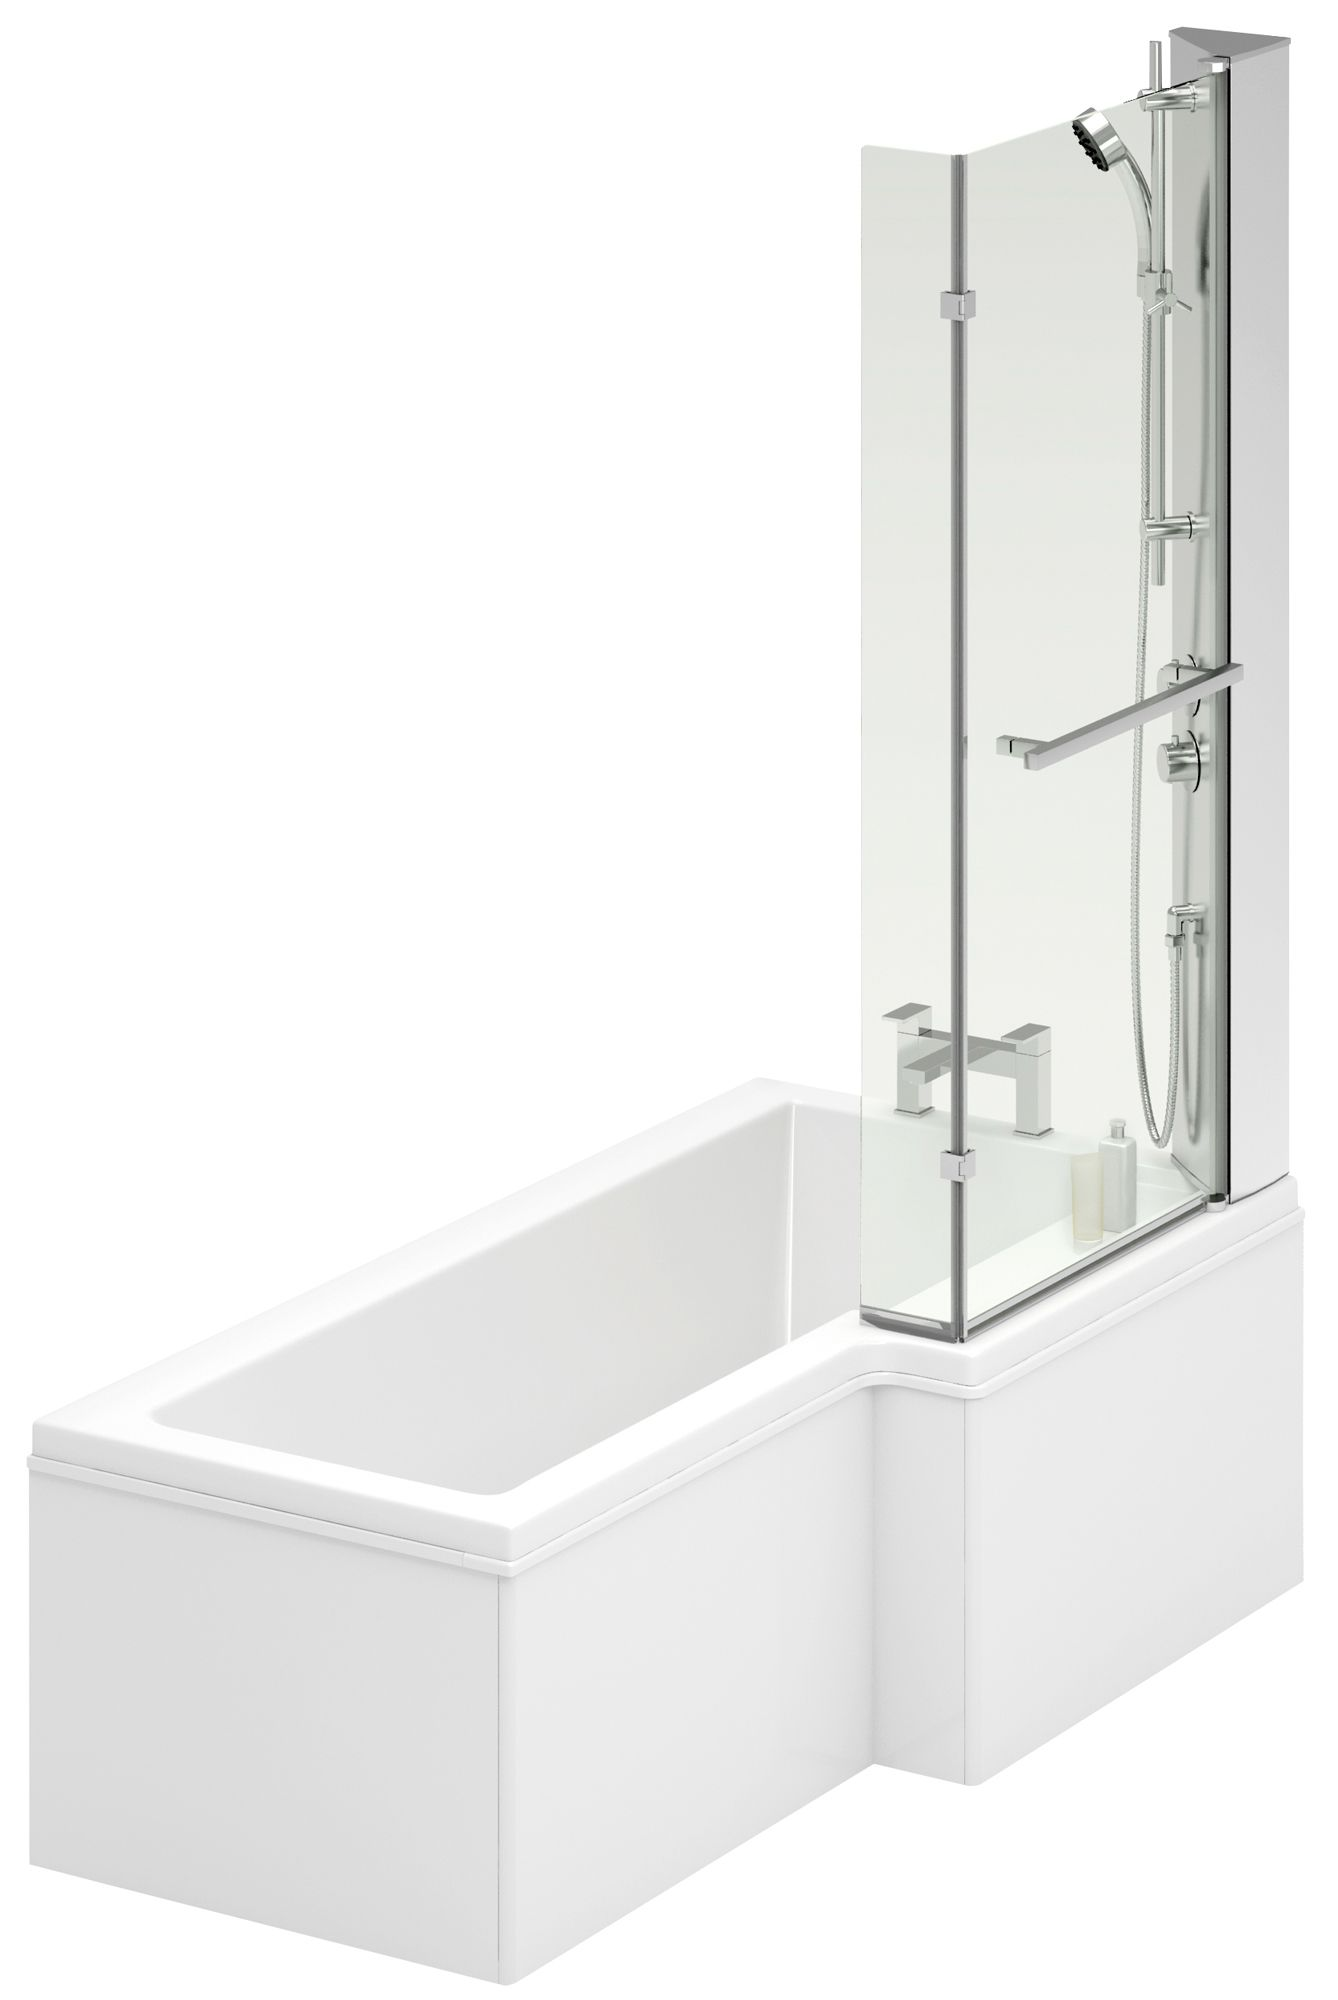 Cooke Amp Lewis Adelphi Rh Acrylic L Shaped Shower Bath L